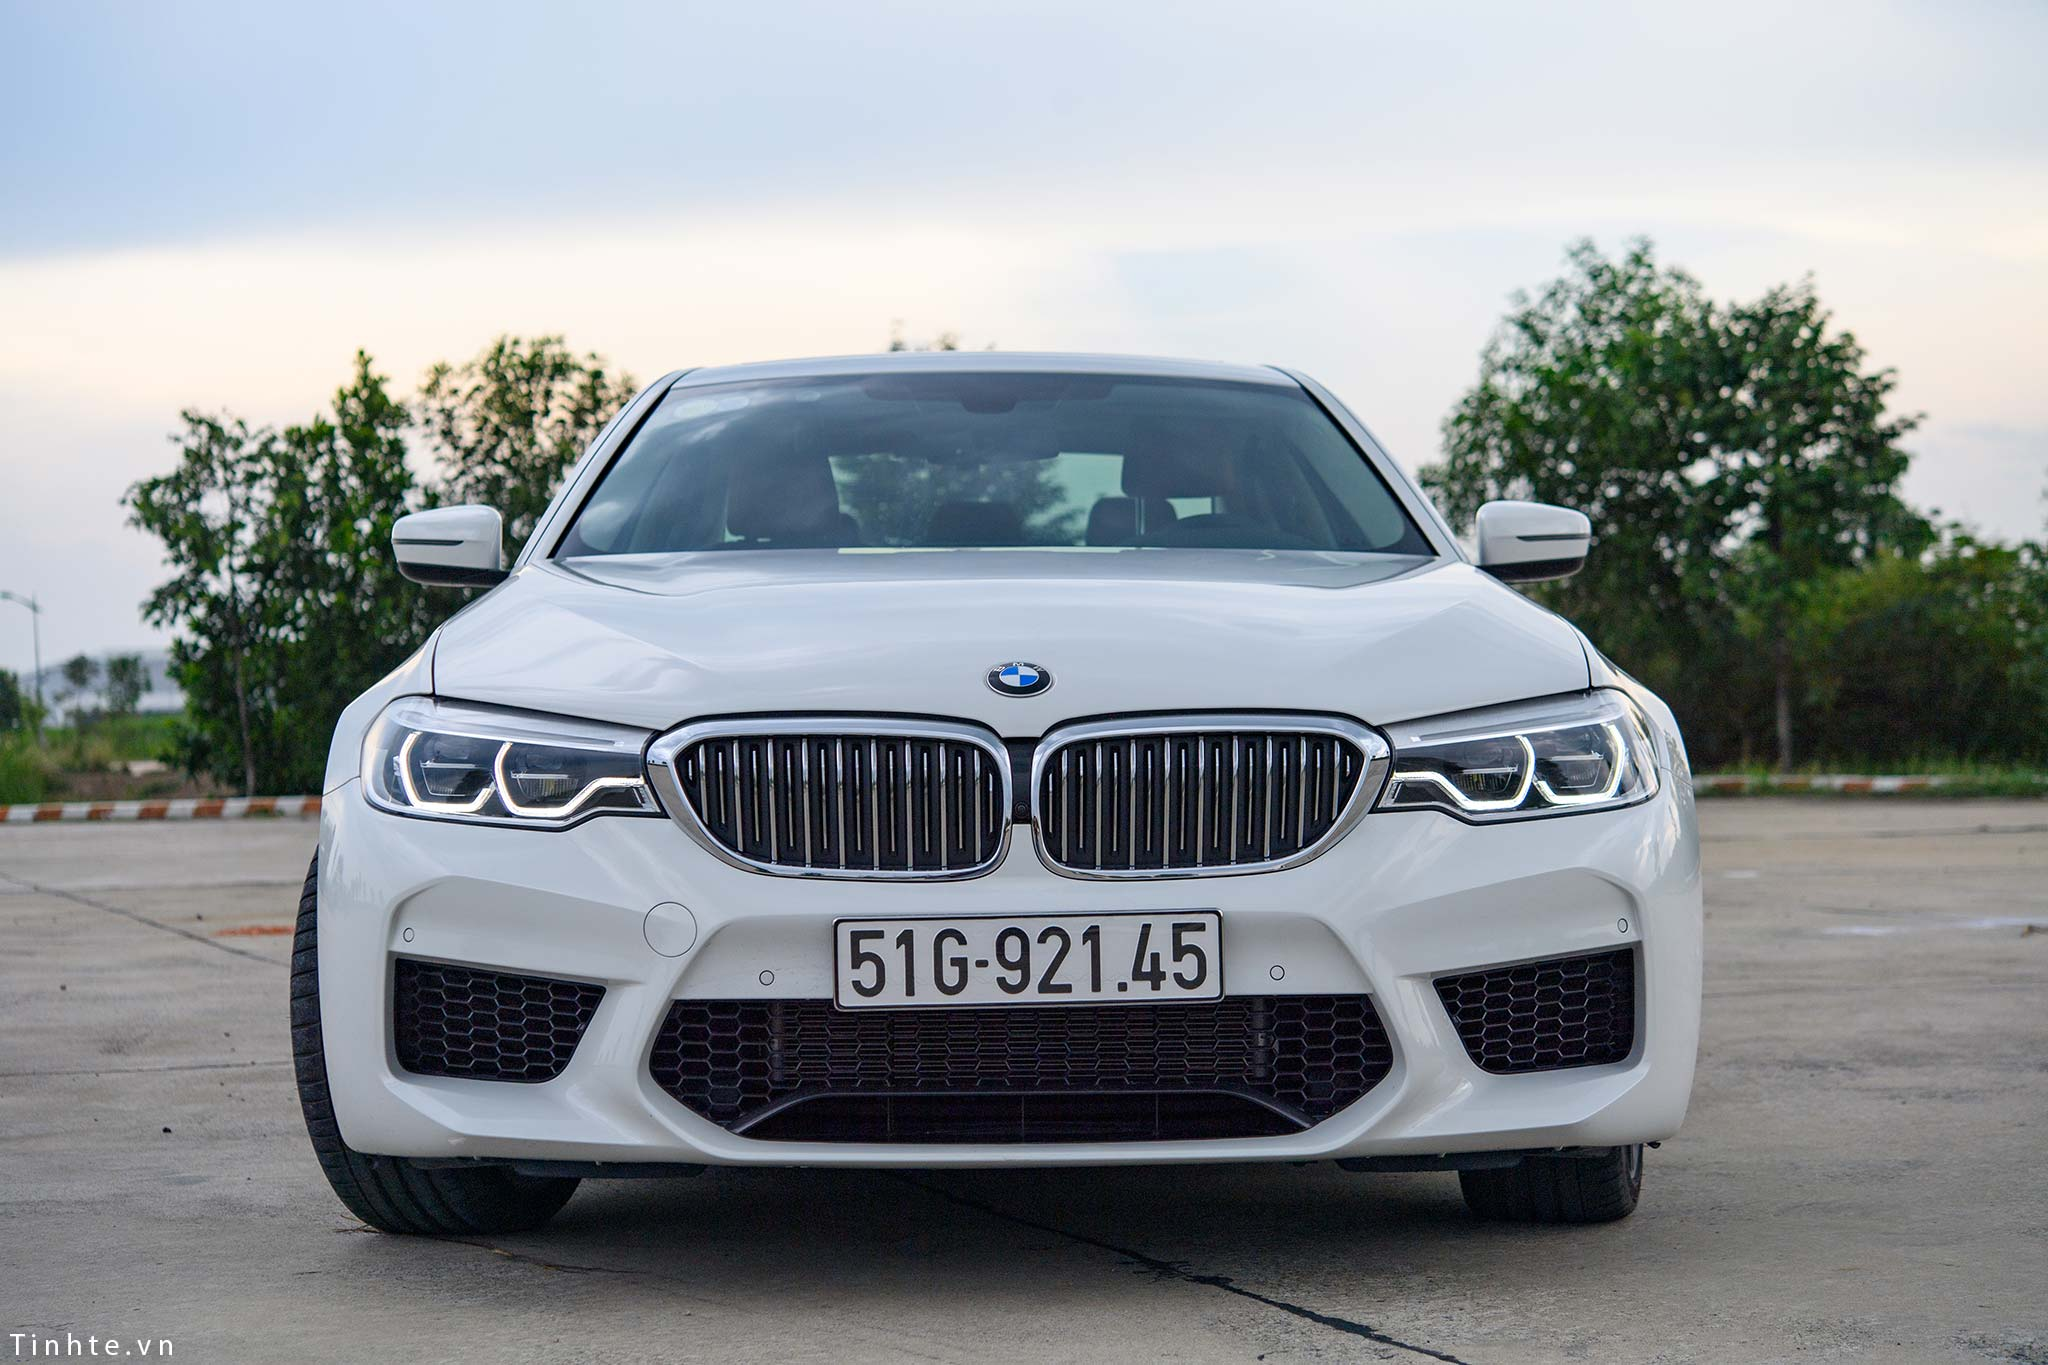 BMW_530i_G30_tinhte_1.jpg